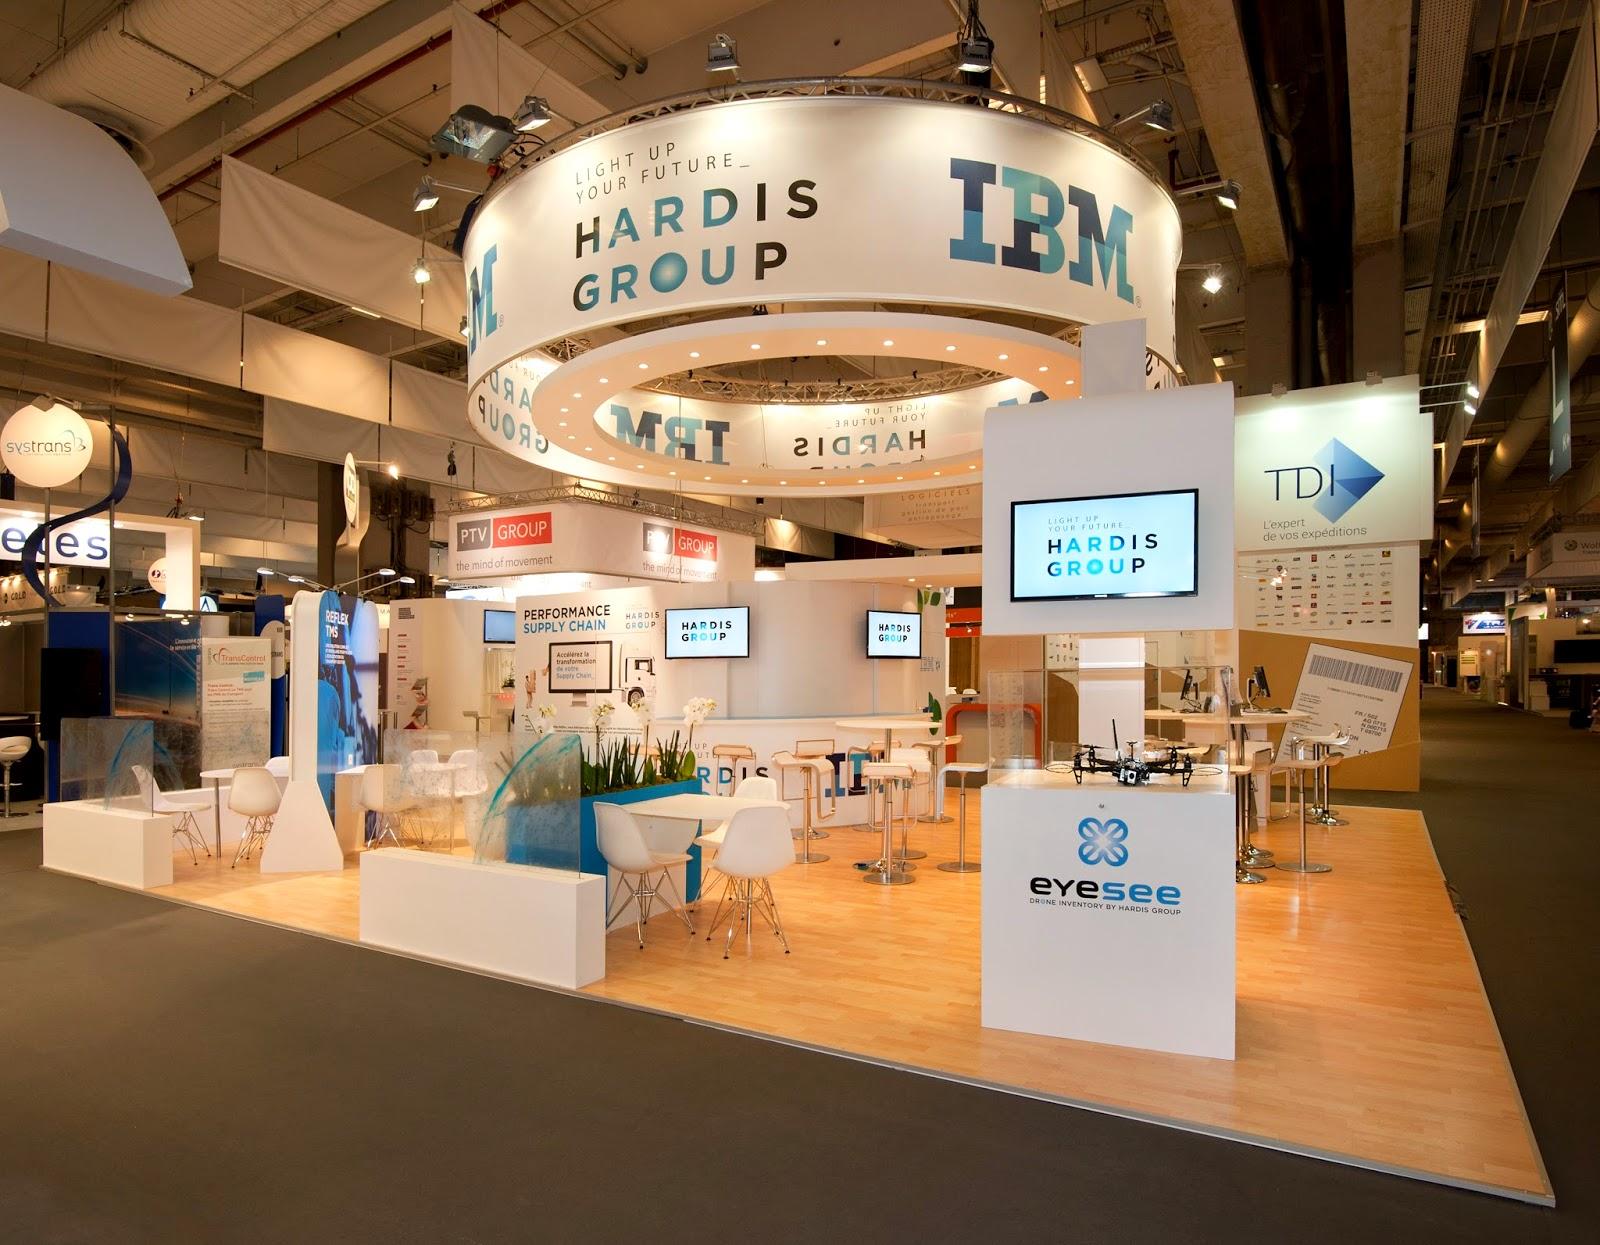 SITL-2015--hardis-ibm---esn-lille-ssii-grenoble-paris-lyon-nantes-bordeaux-hardis-group